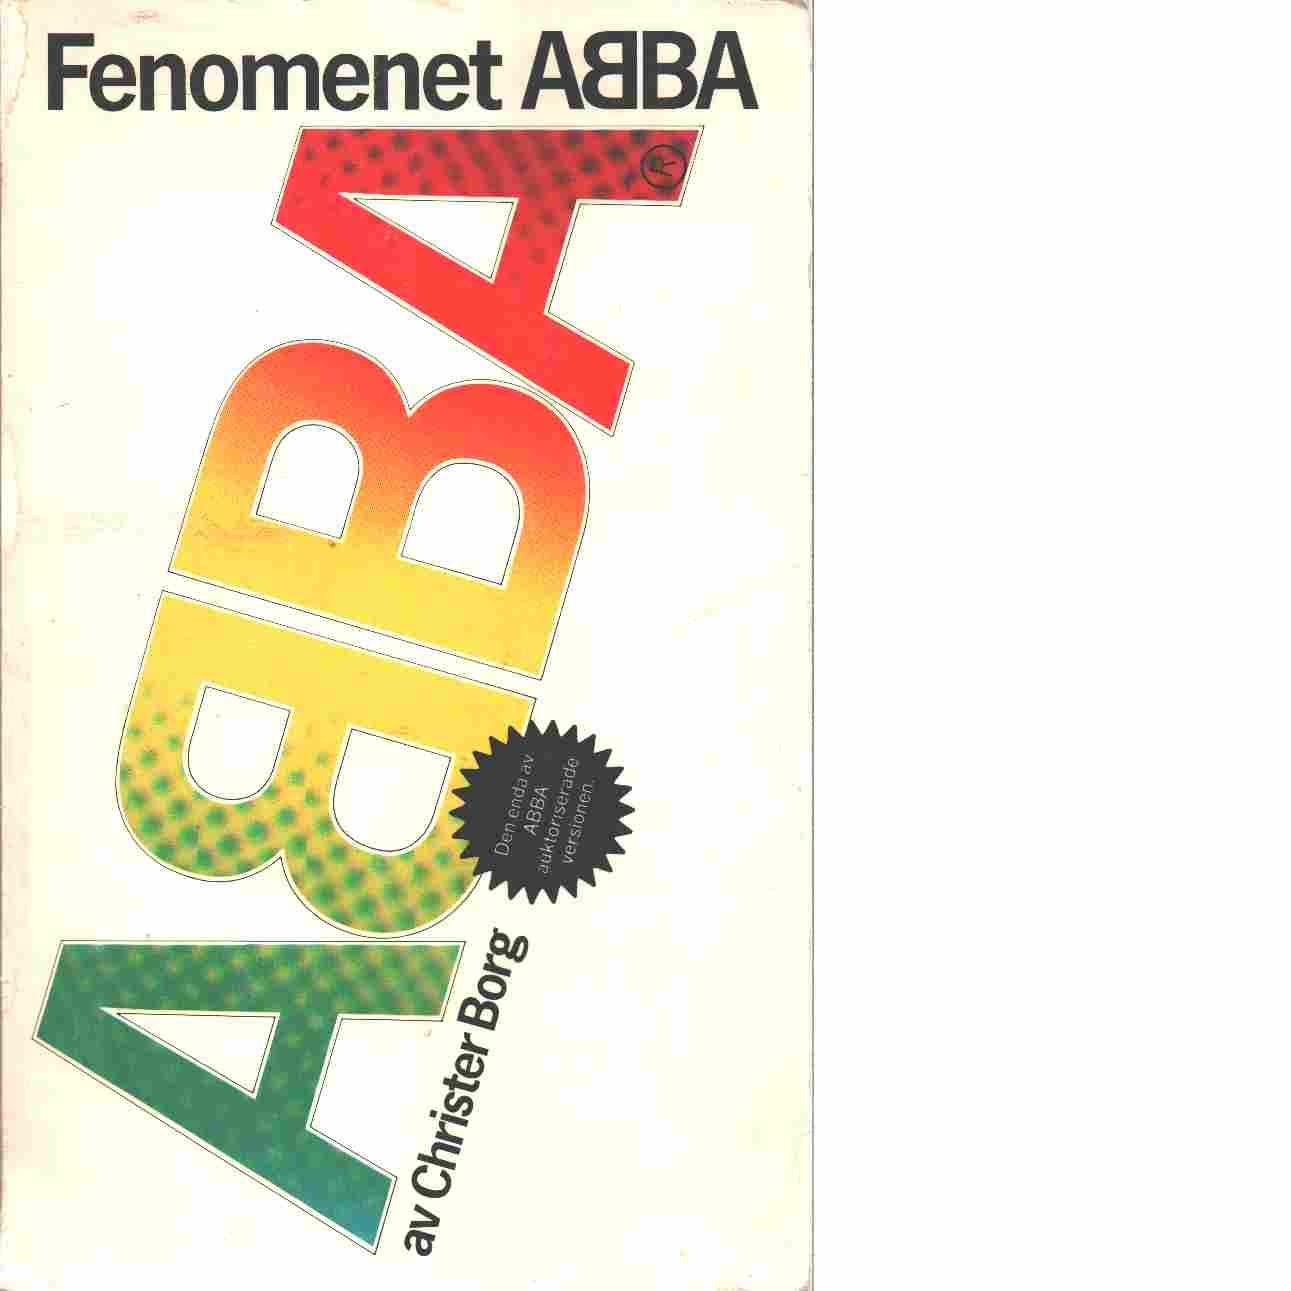 Fenomenet ABBA - Borg, Christer